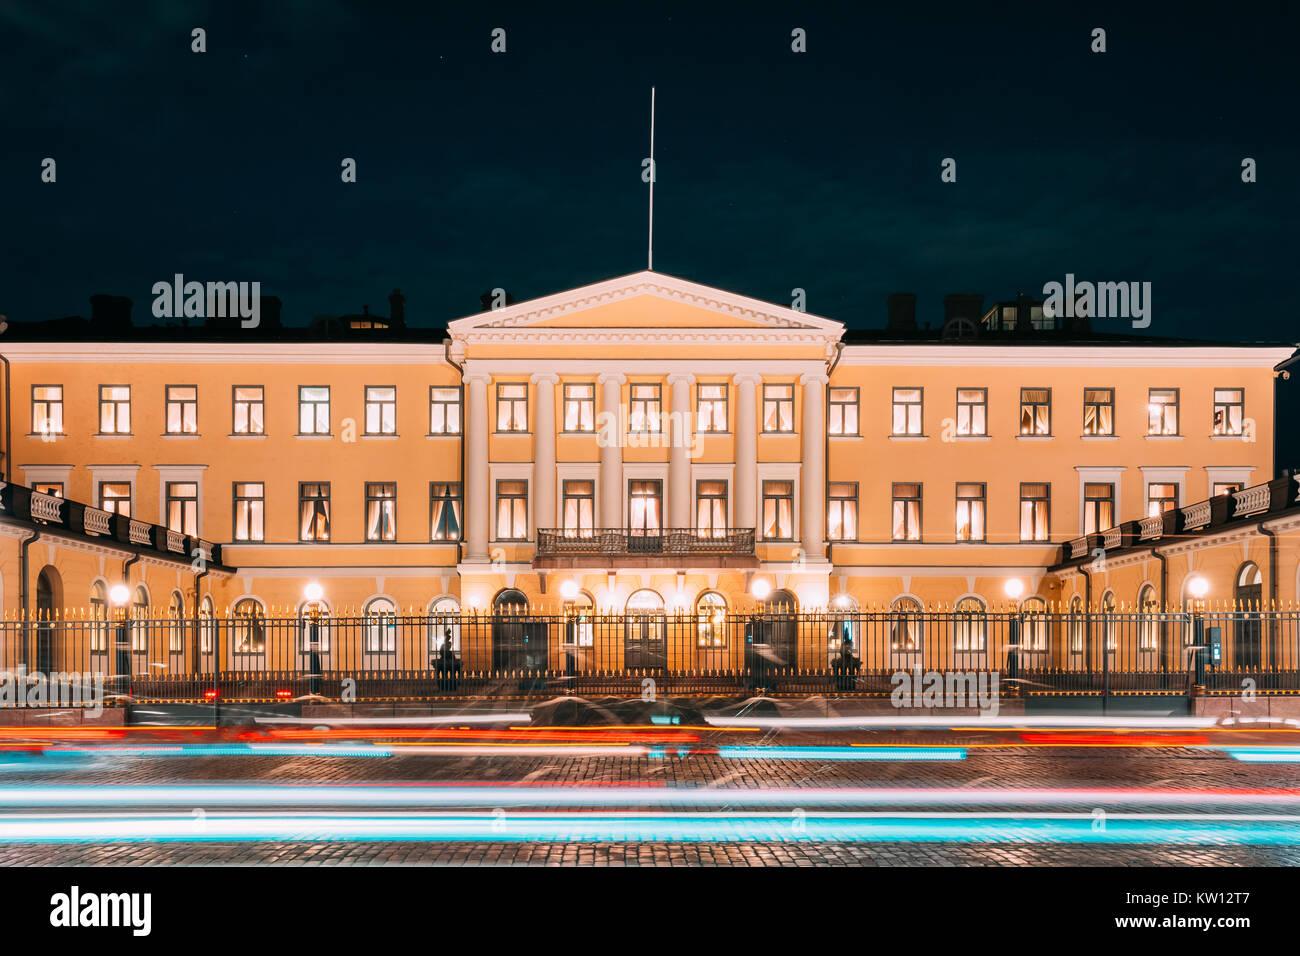 Helsinki, Finnland. Präsidentenpalast in abendlichen Illuminationen. Büro des Präsidenten und des privaten Apartments Stockfoto